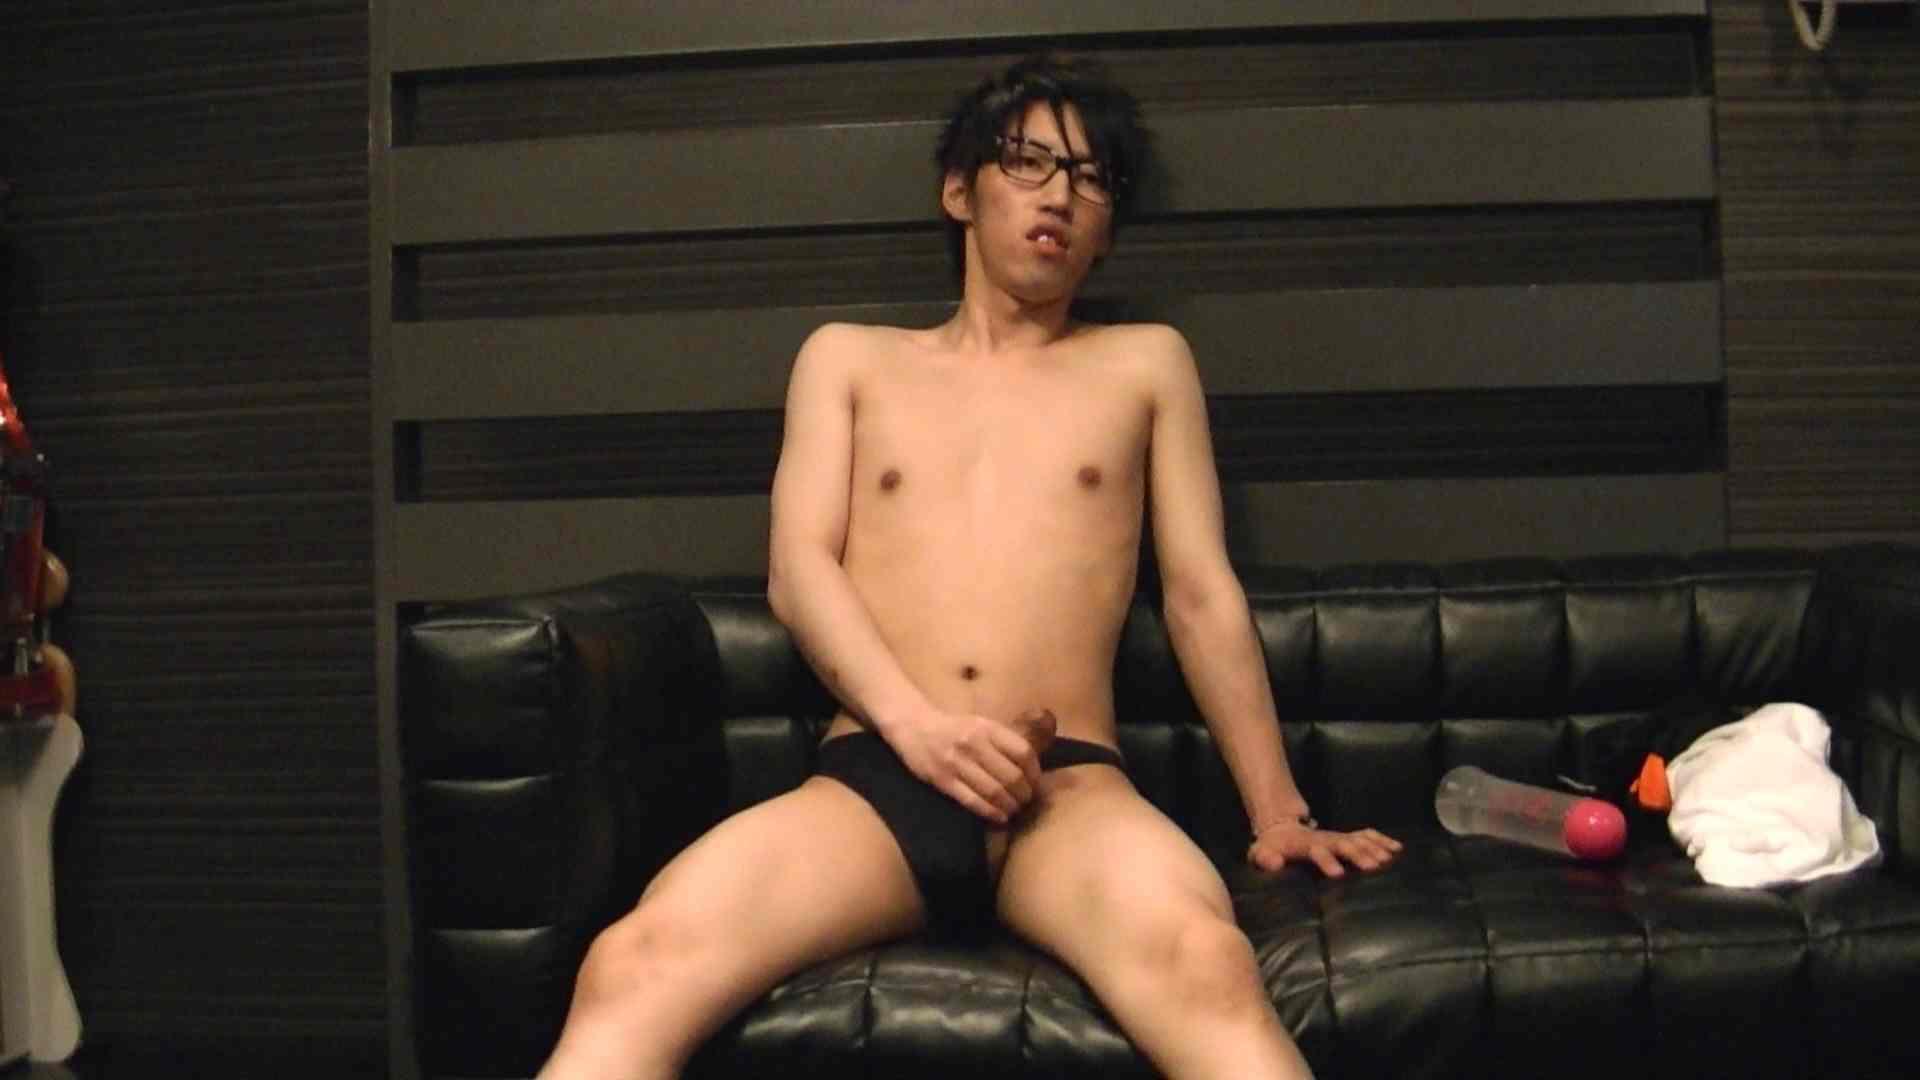 Mr.オナックスさん投稿!HD 貴方のオナニー三万円で撮影させてください。VOL.04 スリム美少年系ジャニ系 ゲイエロビデオ画像 55連発 34